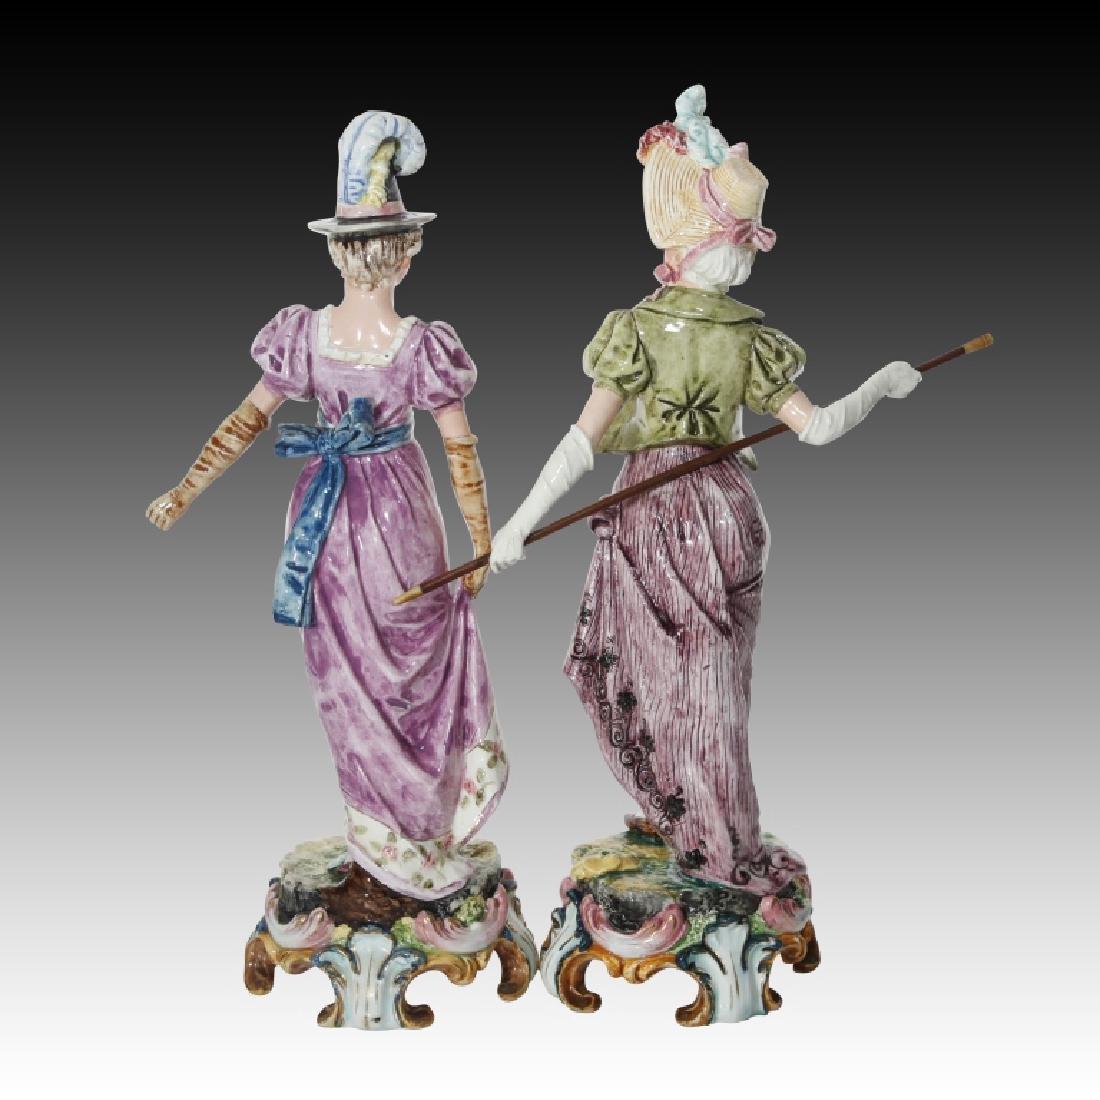 Majolica Figural Pair of Women in Regency Dress - 3